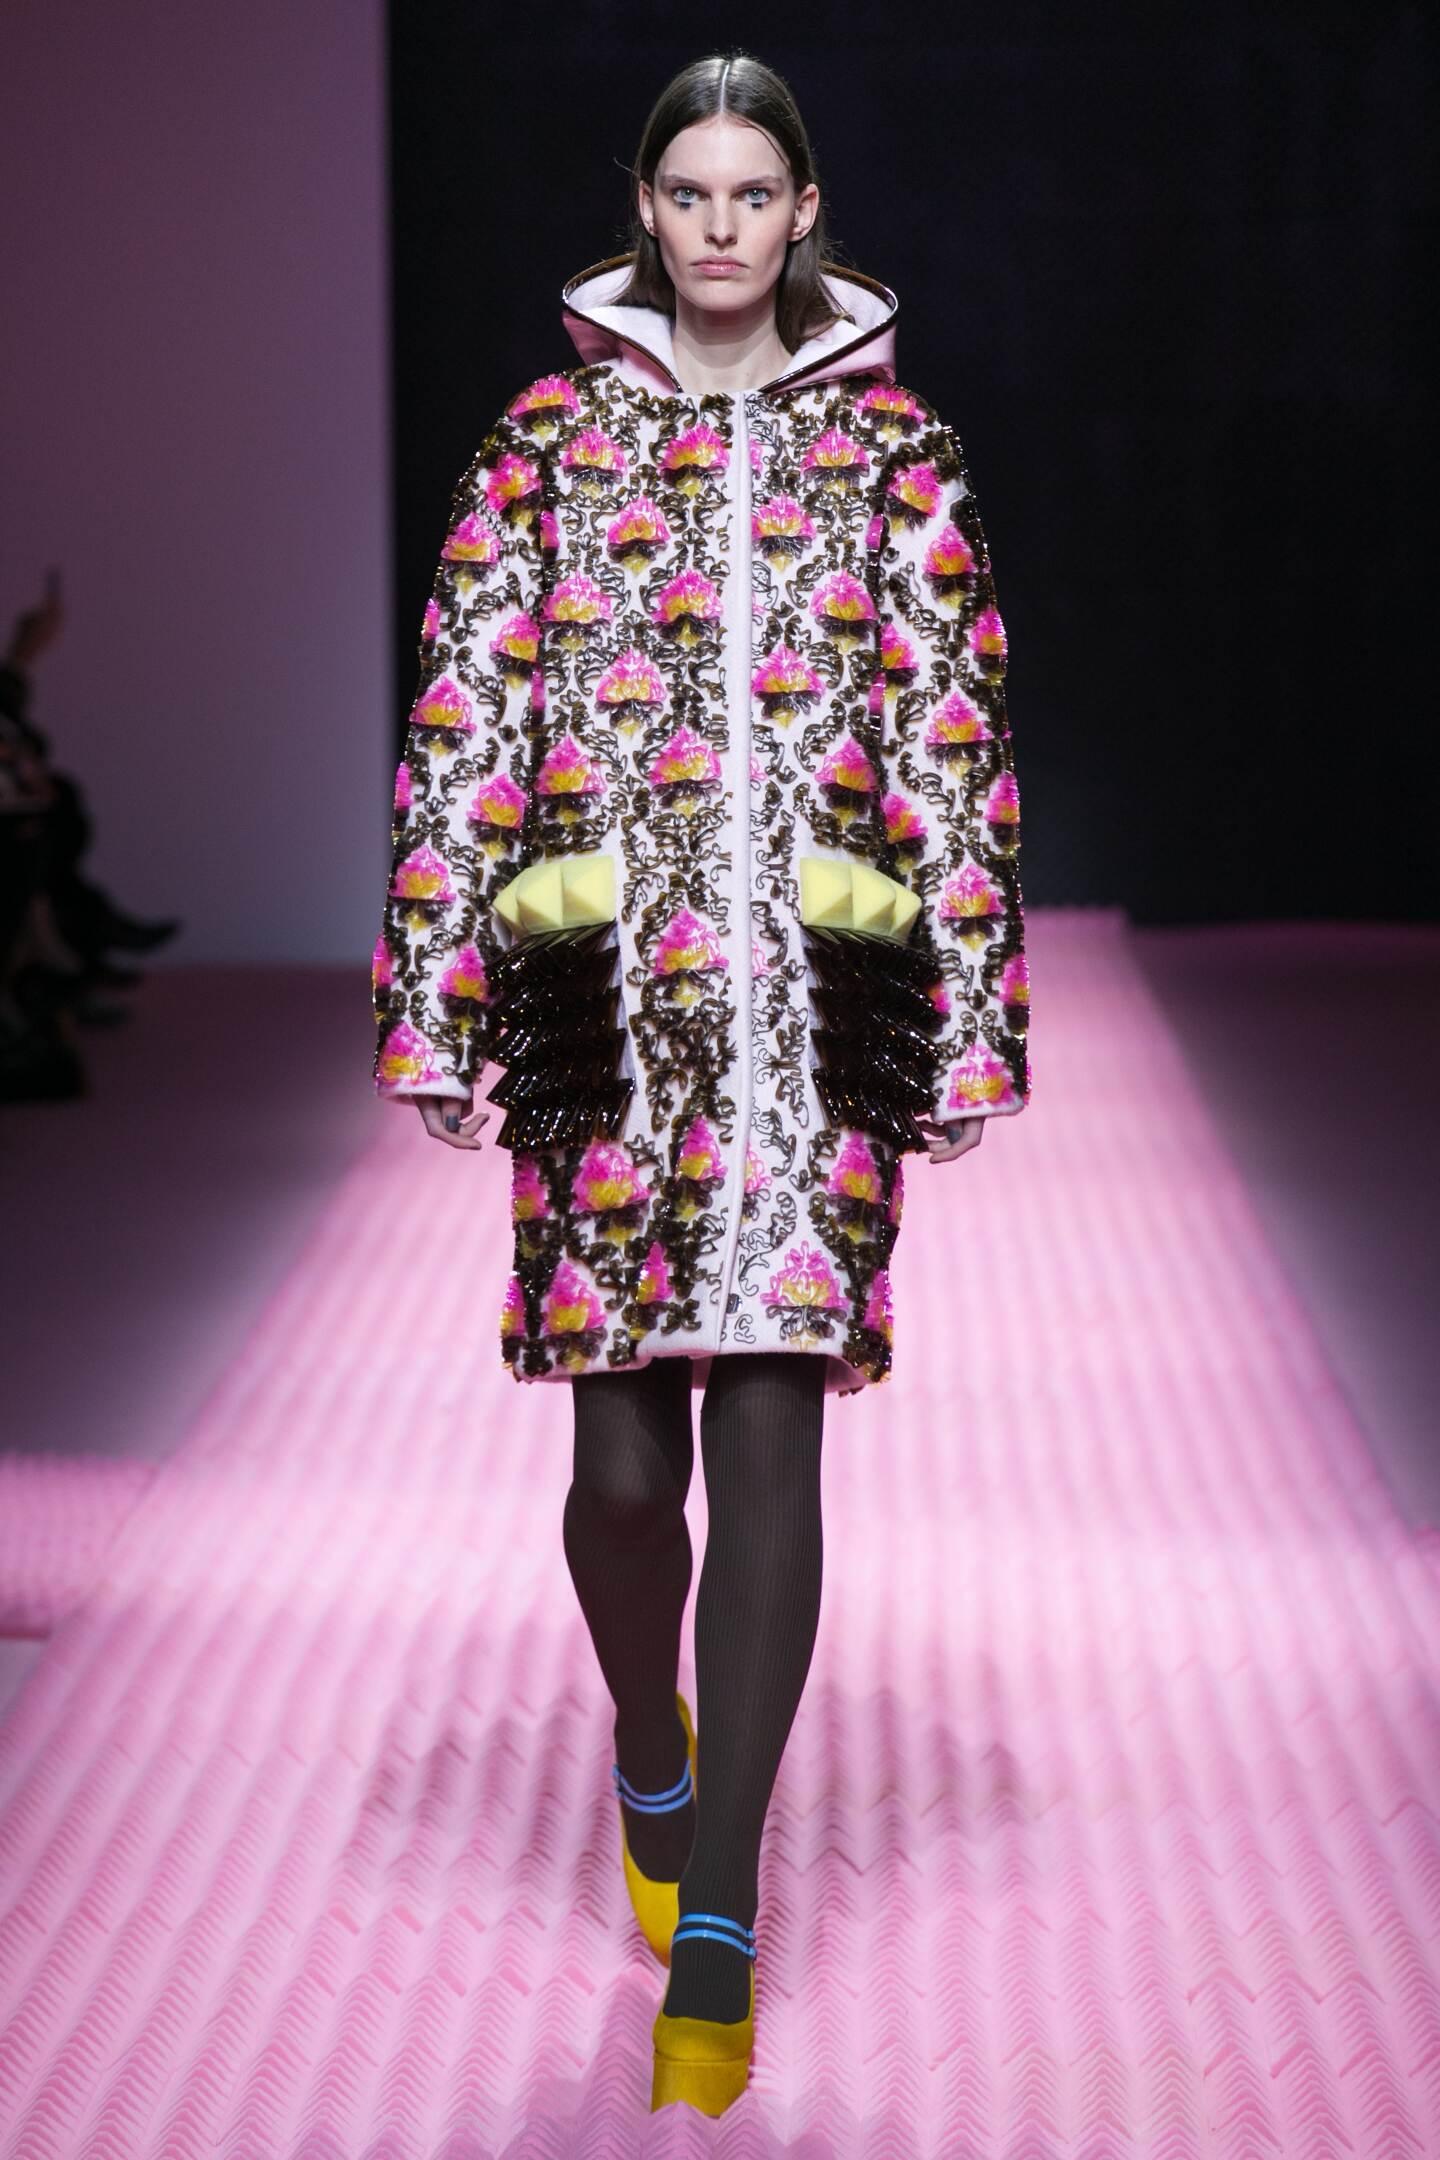 Winter Fashion Trends 2015 2016 Mary Katrantzou Collection